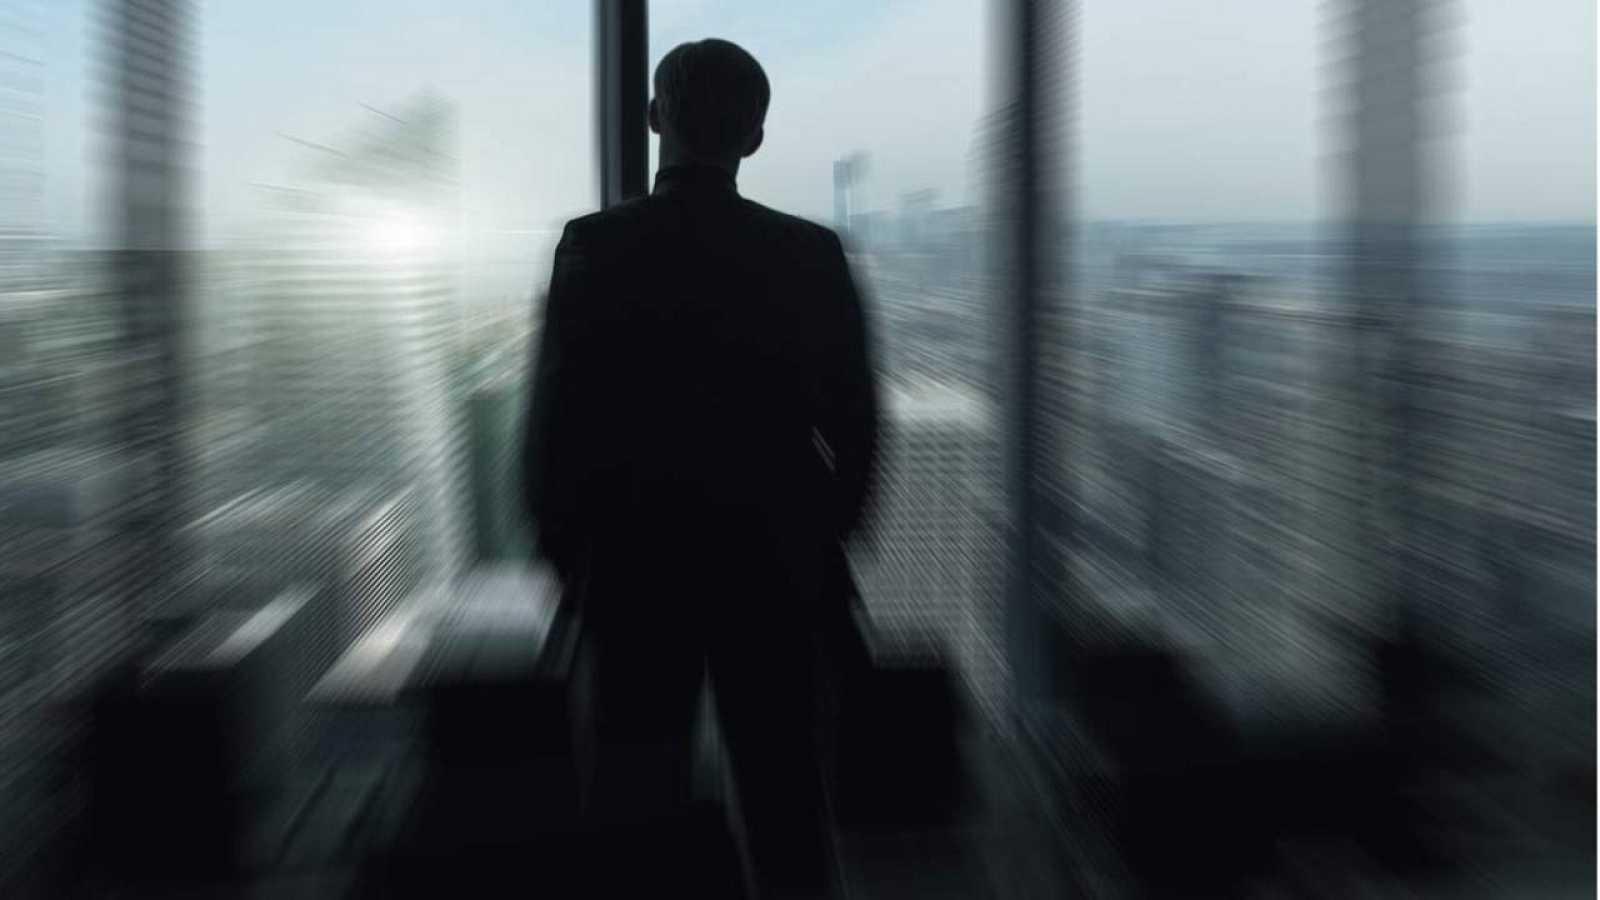 Imagen simbólica de un líder mirando a contraluz un horizonte urbano a través de una ventana.